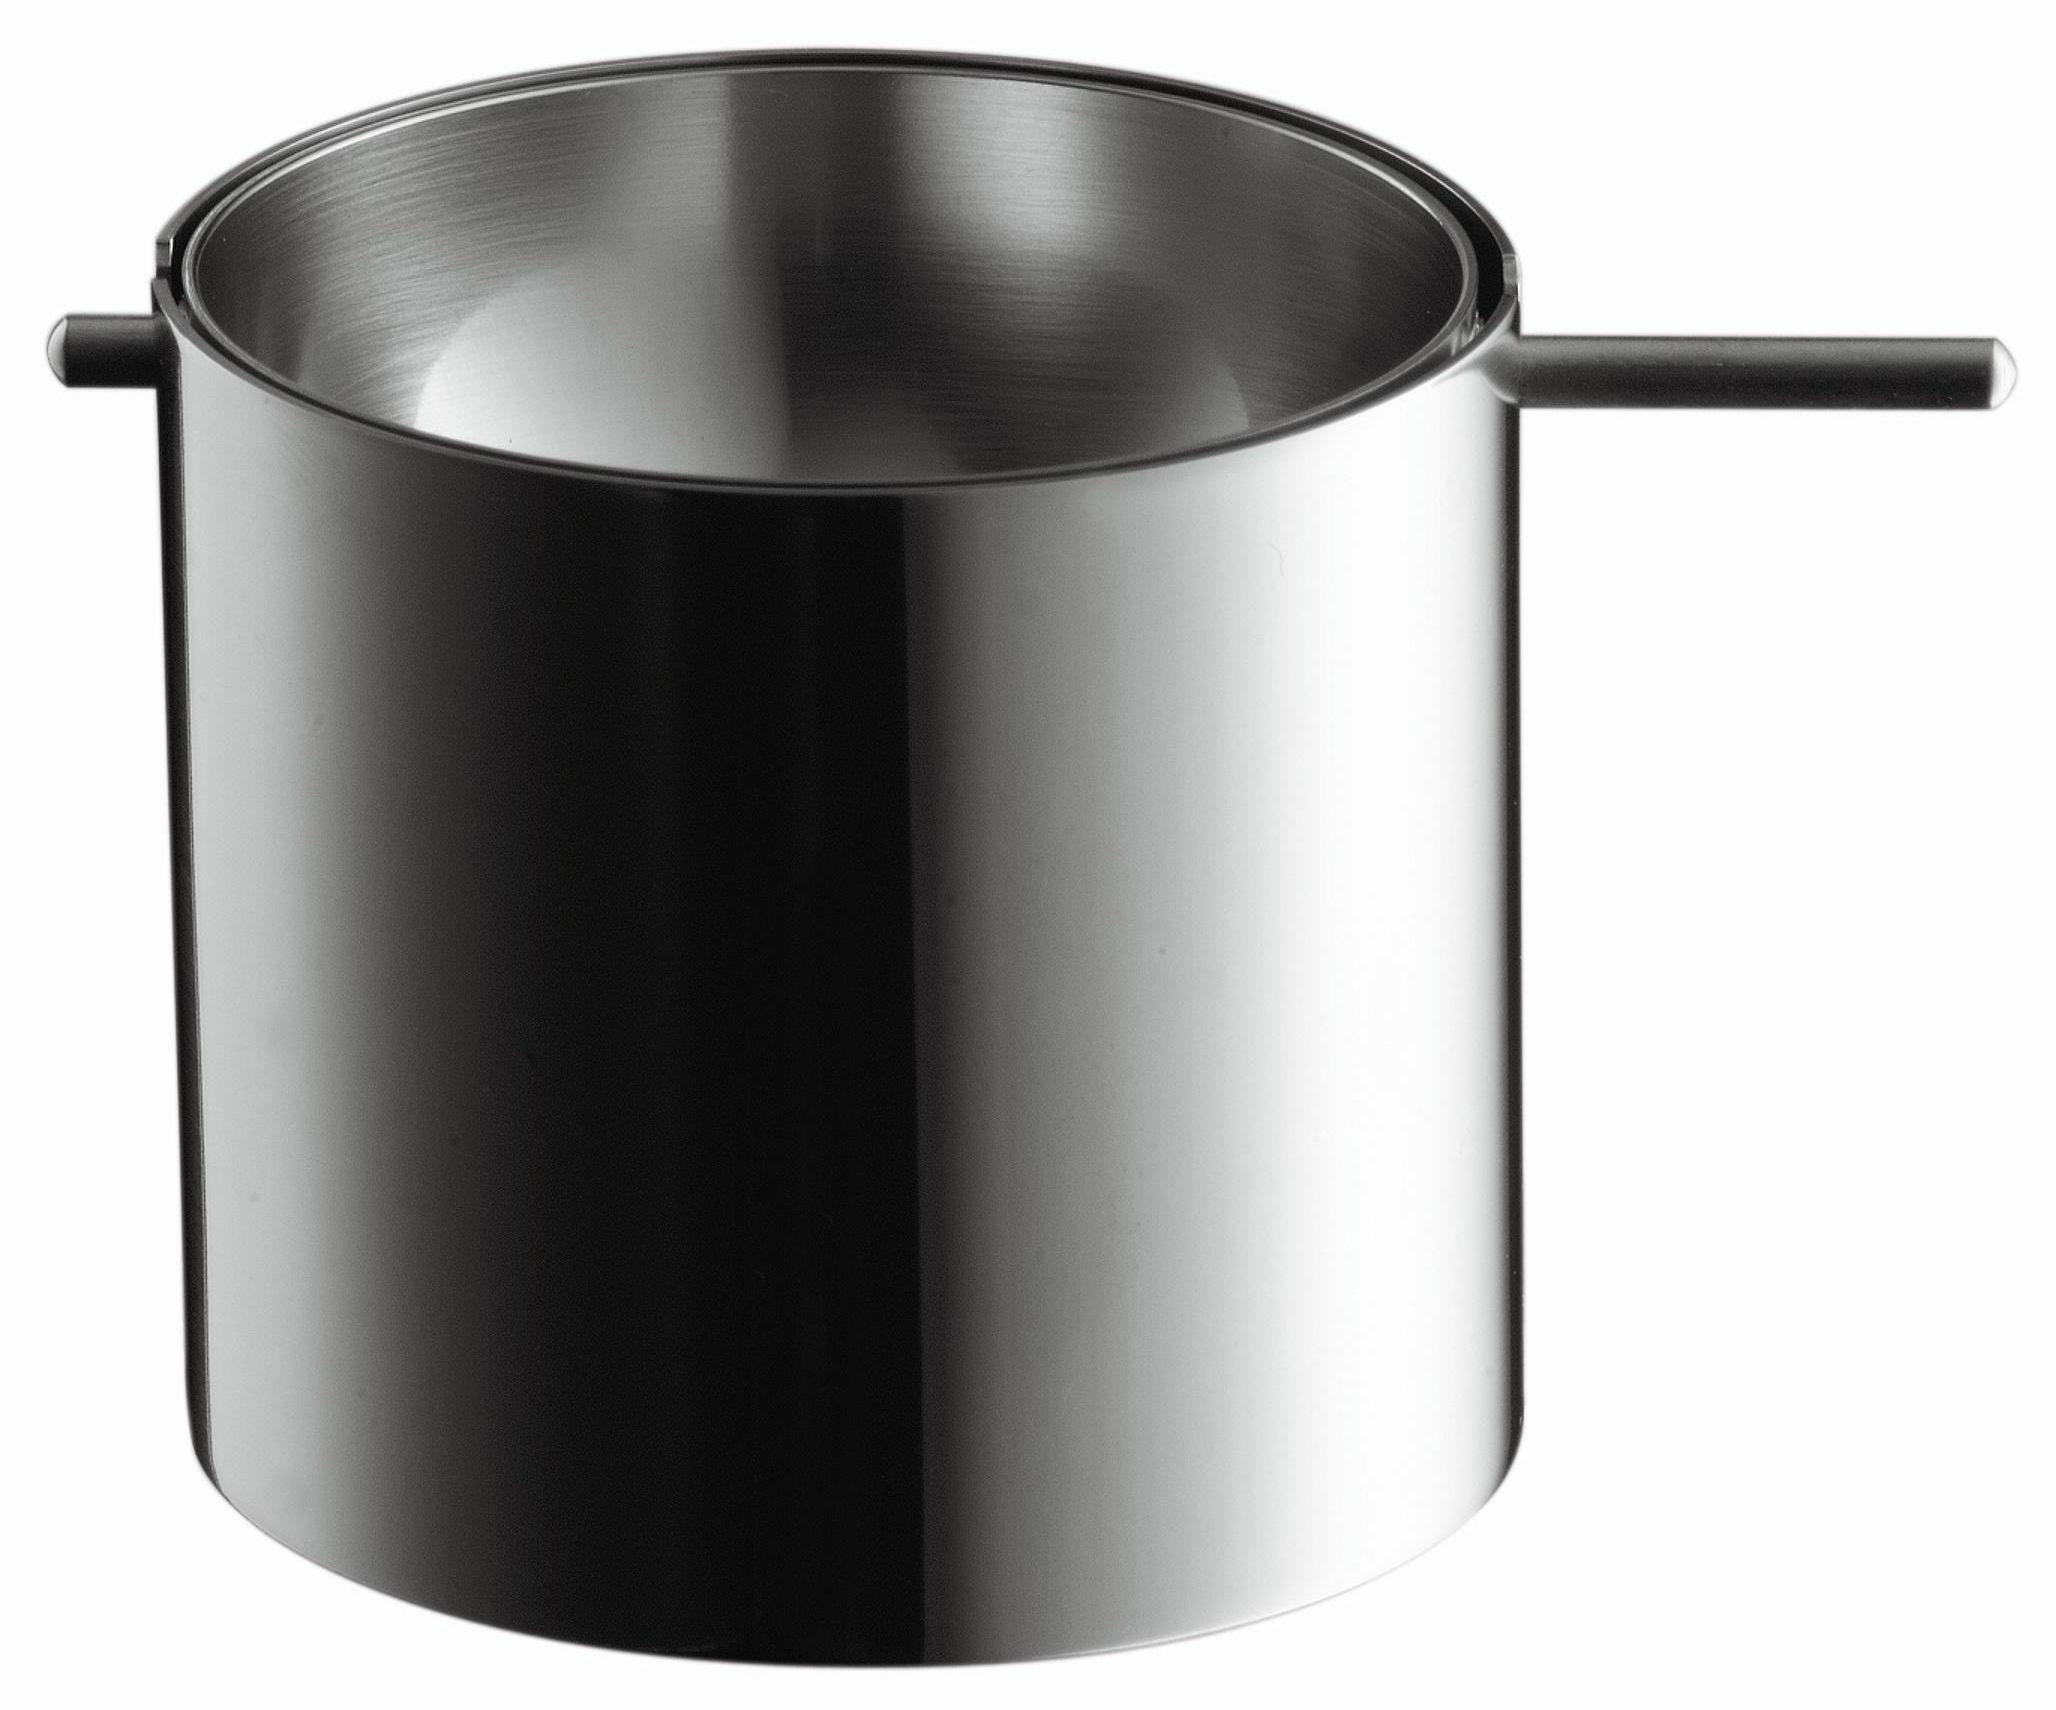 Accessoires - Cendriers - Cendrier Cylinda-Line / Arne Jacobsen, 1967 - Stelton - Small / Acier - Acier inoxydable